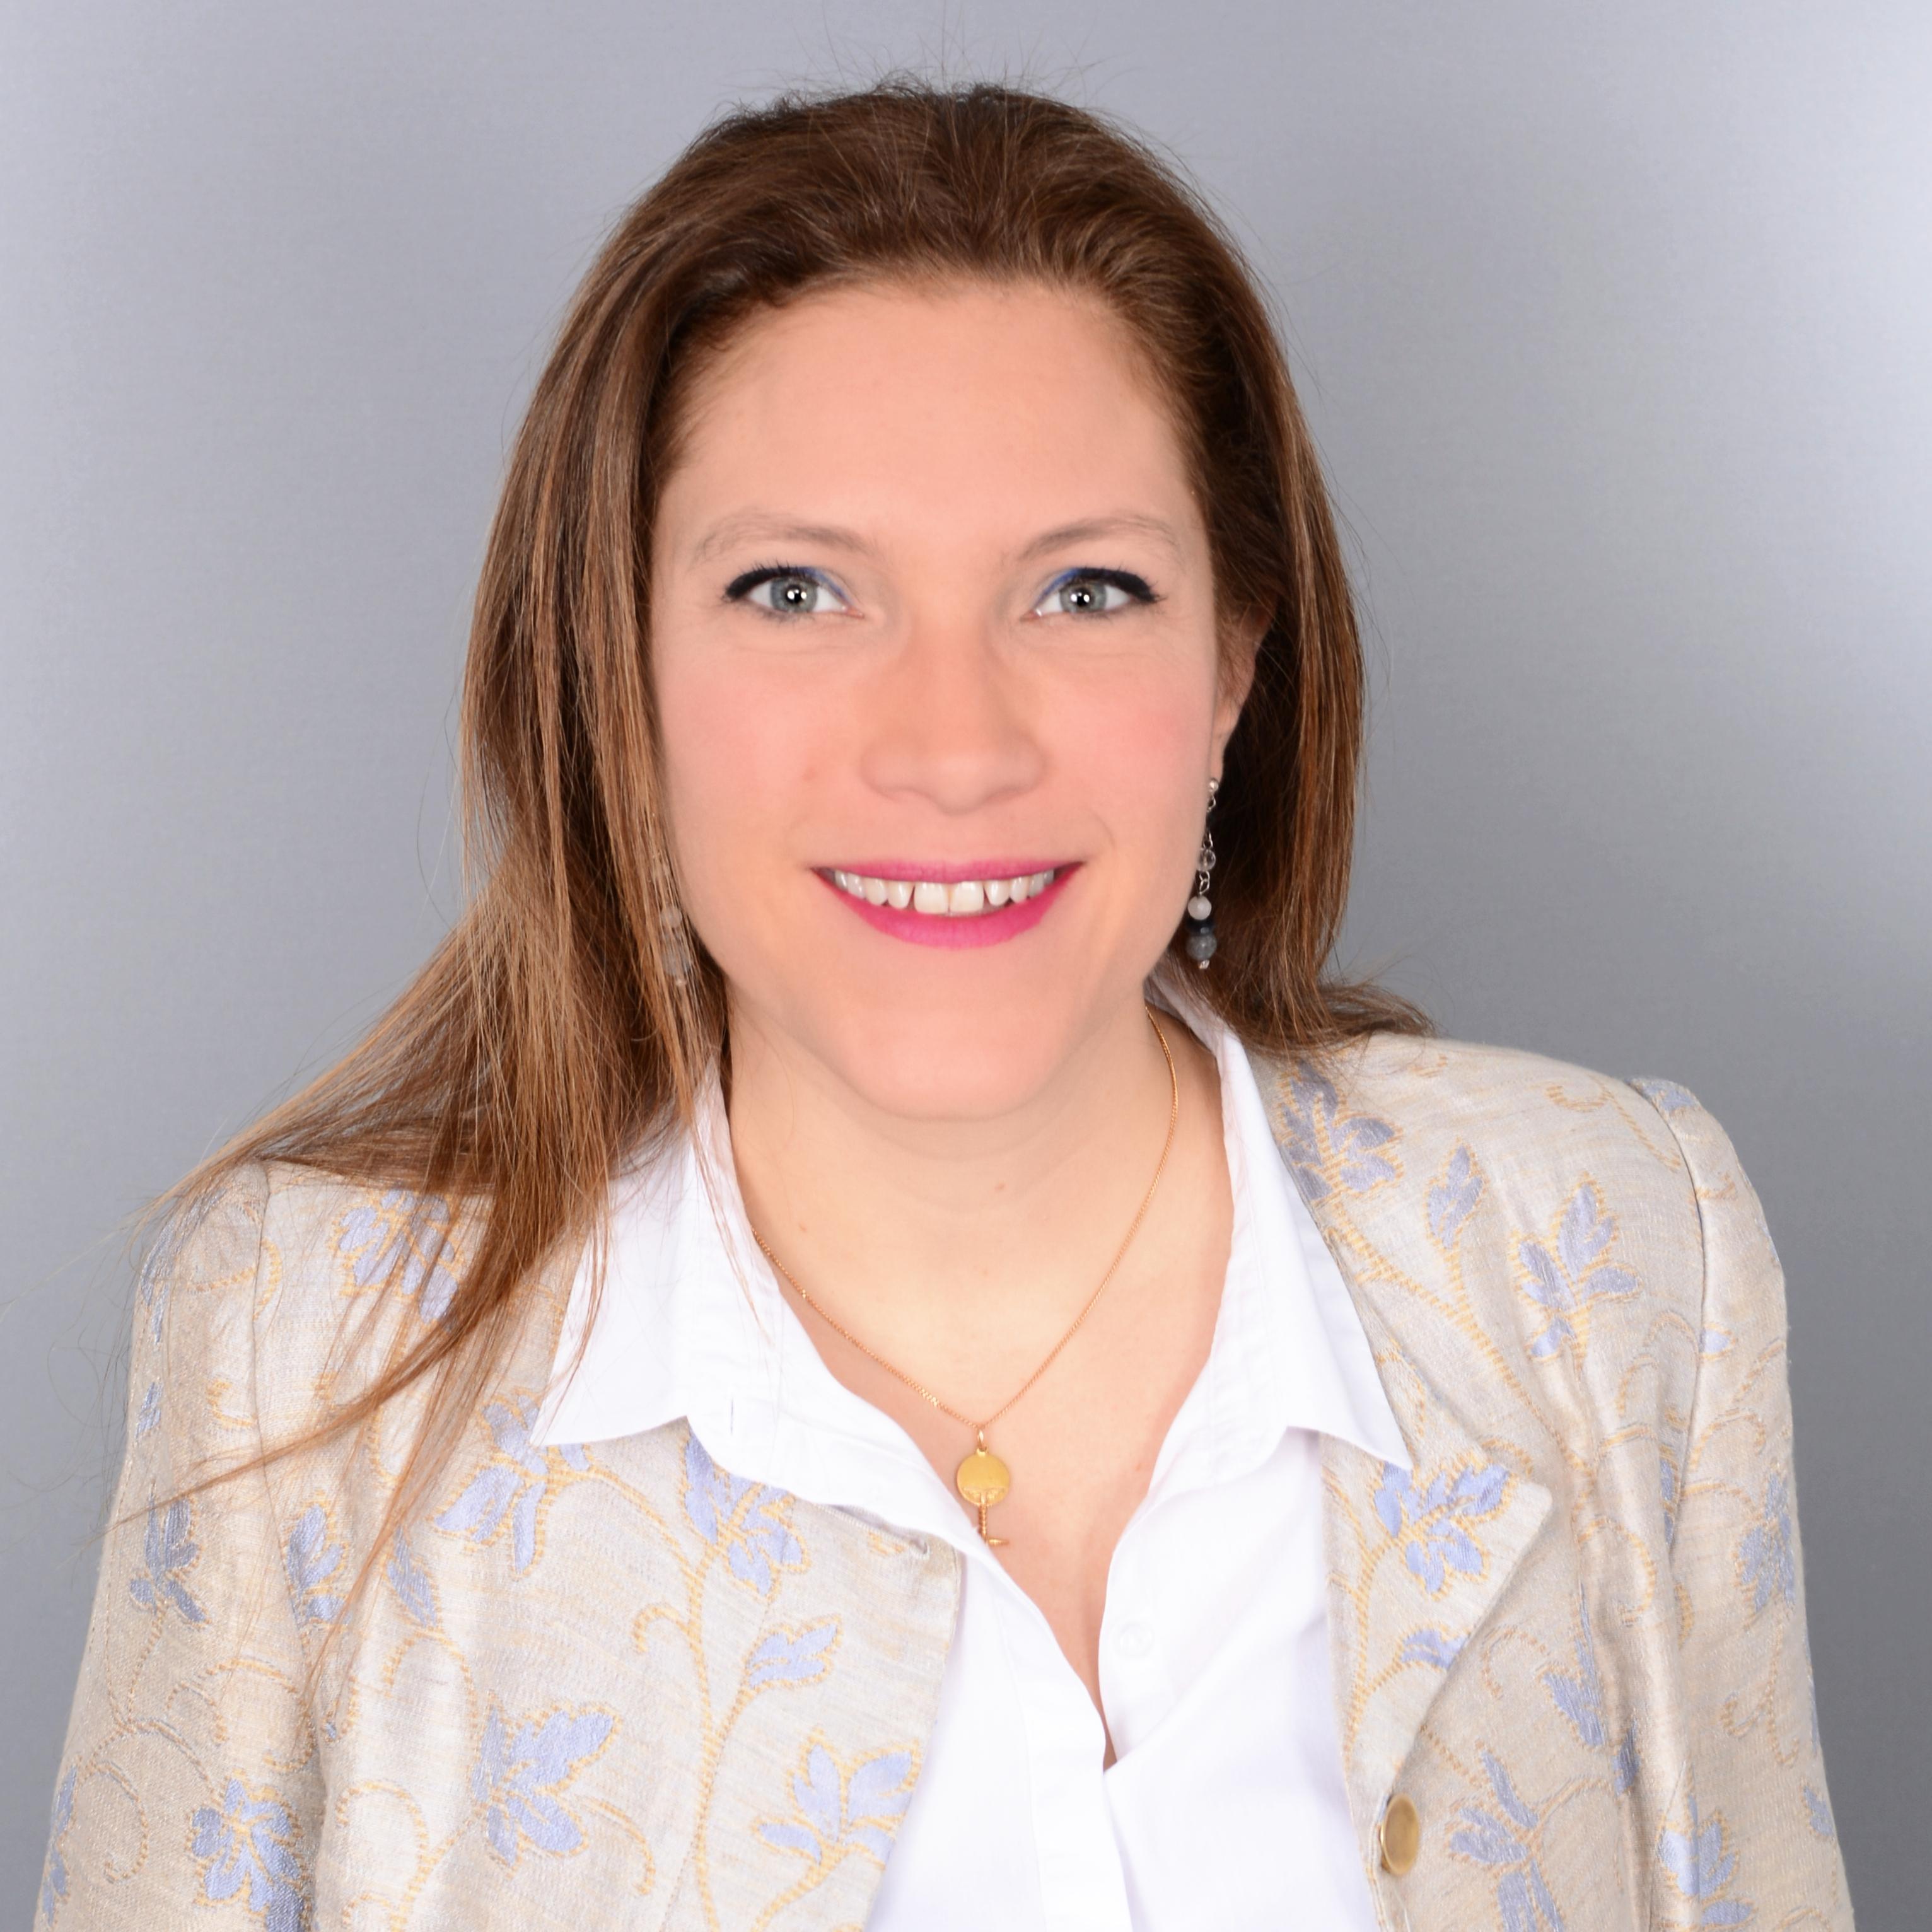 Gwenaëlle Grossiord